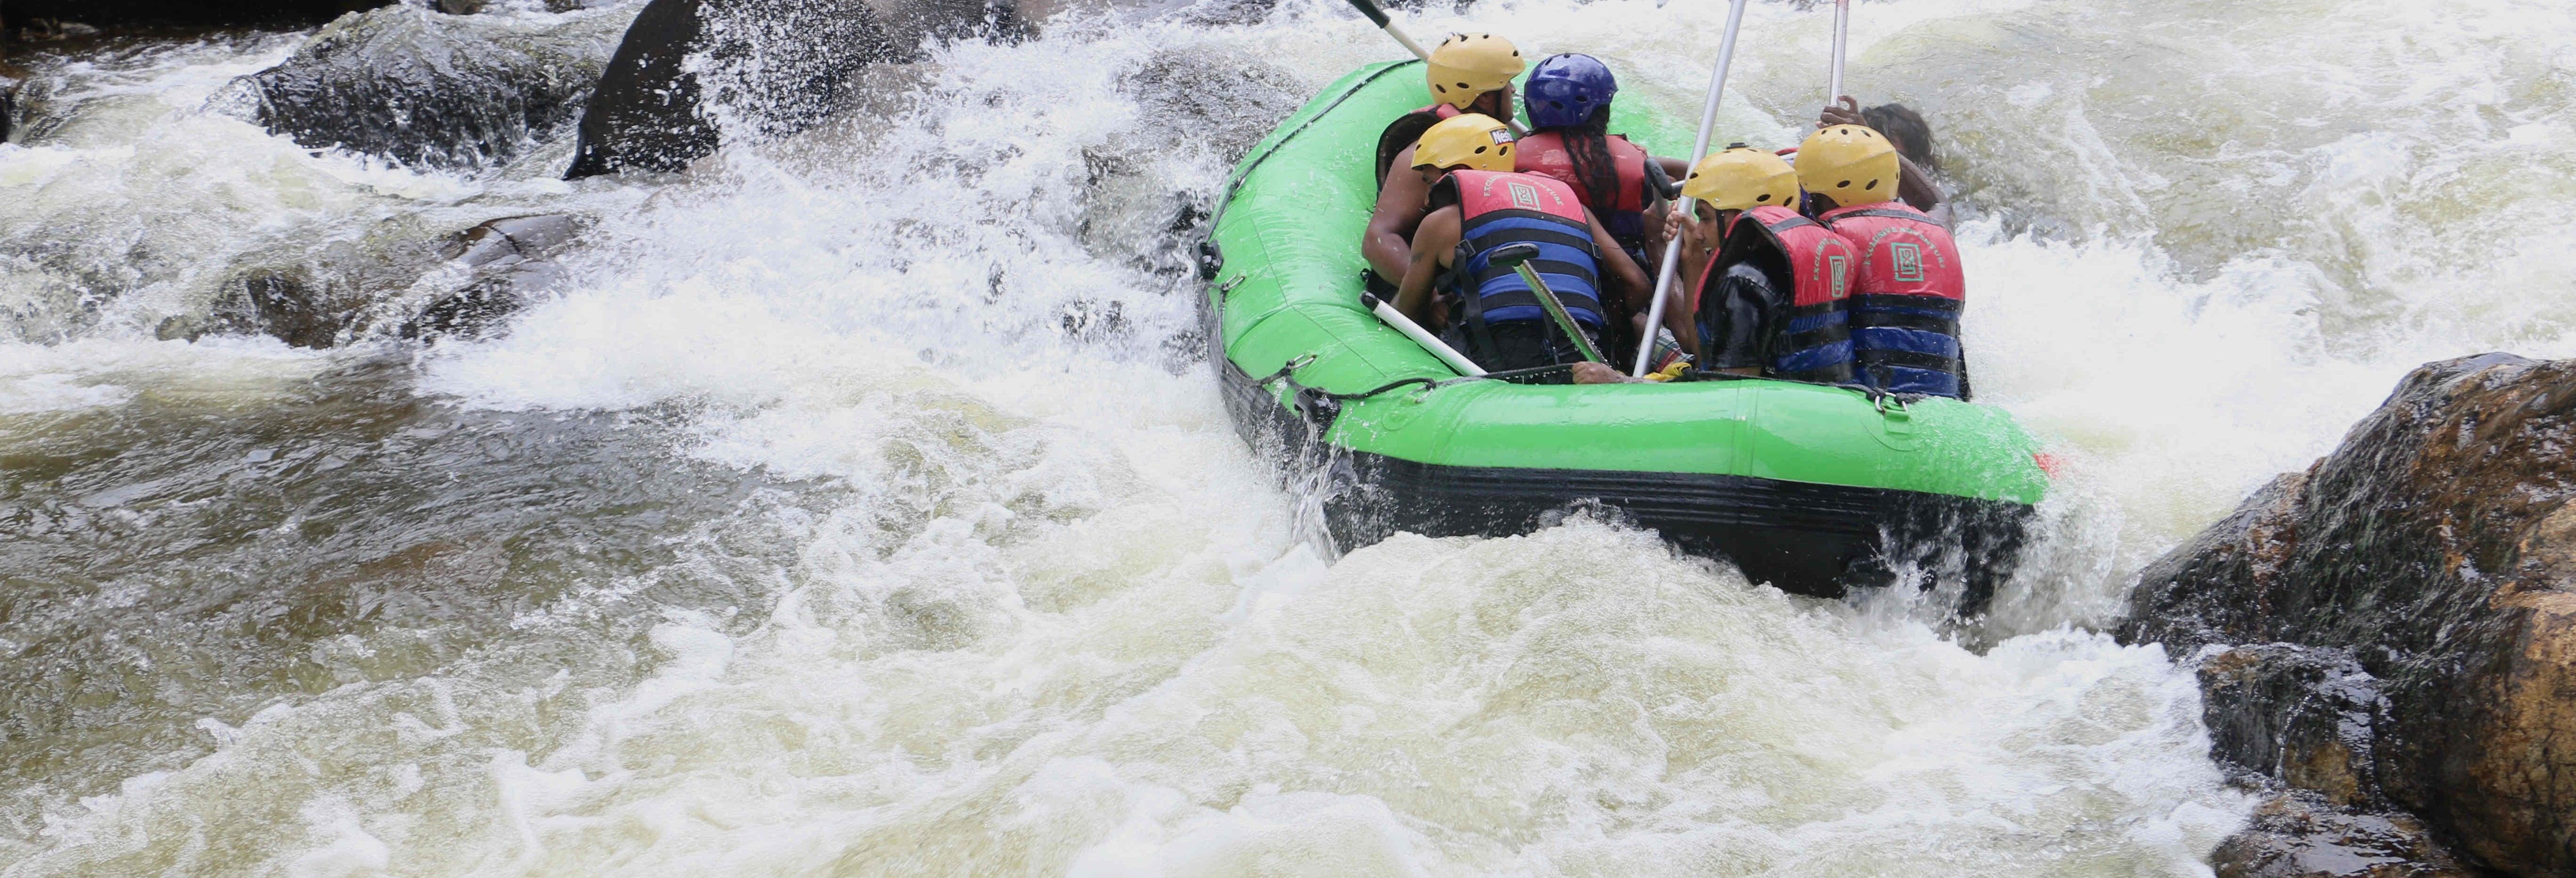 Ruta privada de rafting en Kitulgala